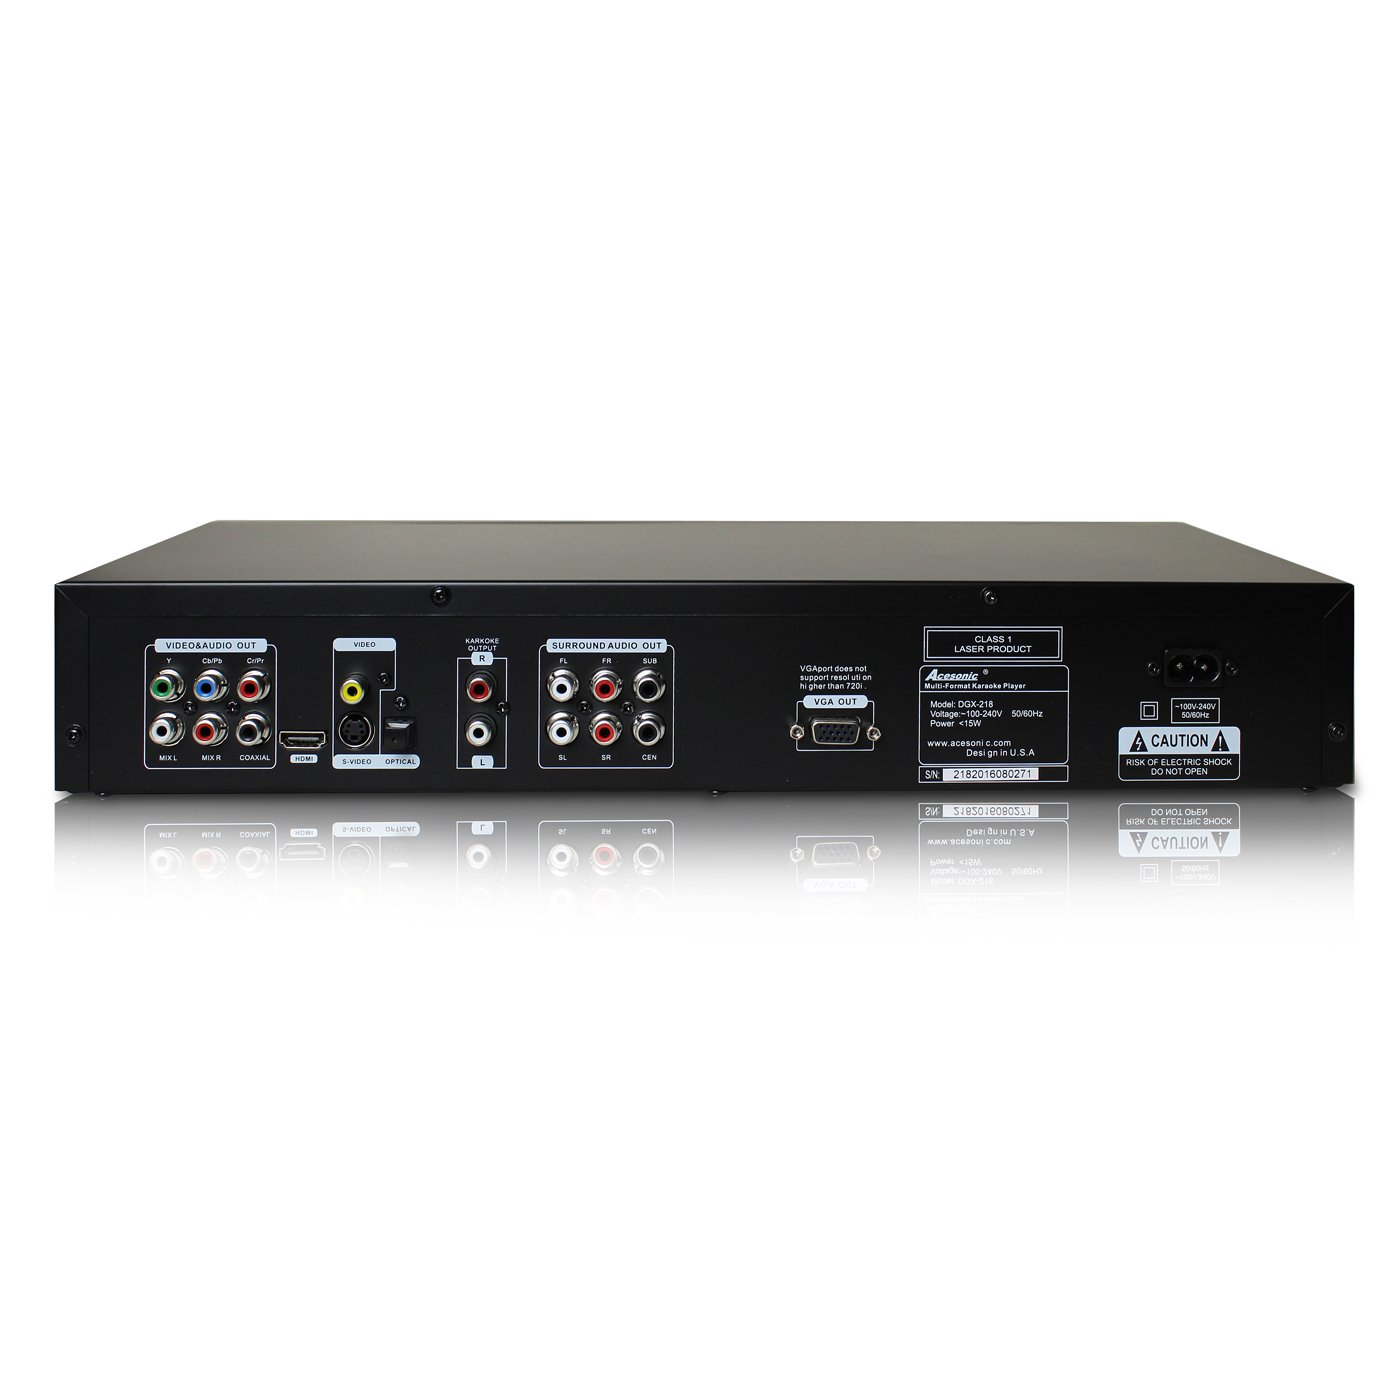 Amazon.com: Acesonic DGX-218 DVD CDG Multi-Format Karaoke Player with 4X CD+G to MP3G Converter: Electronics